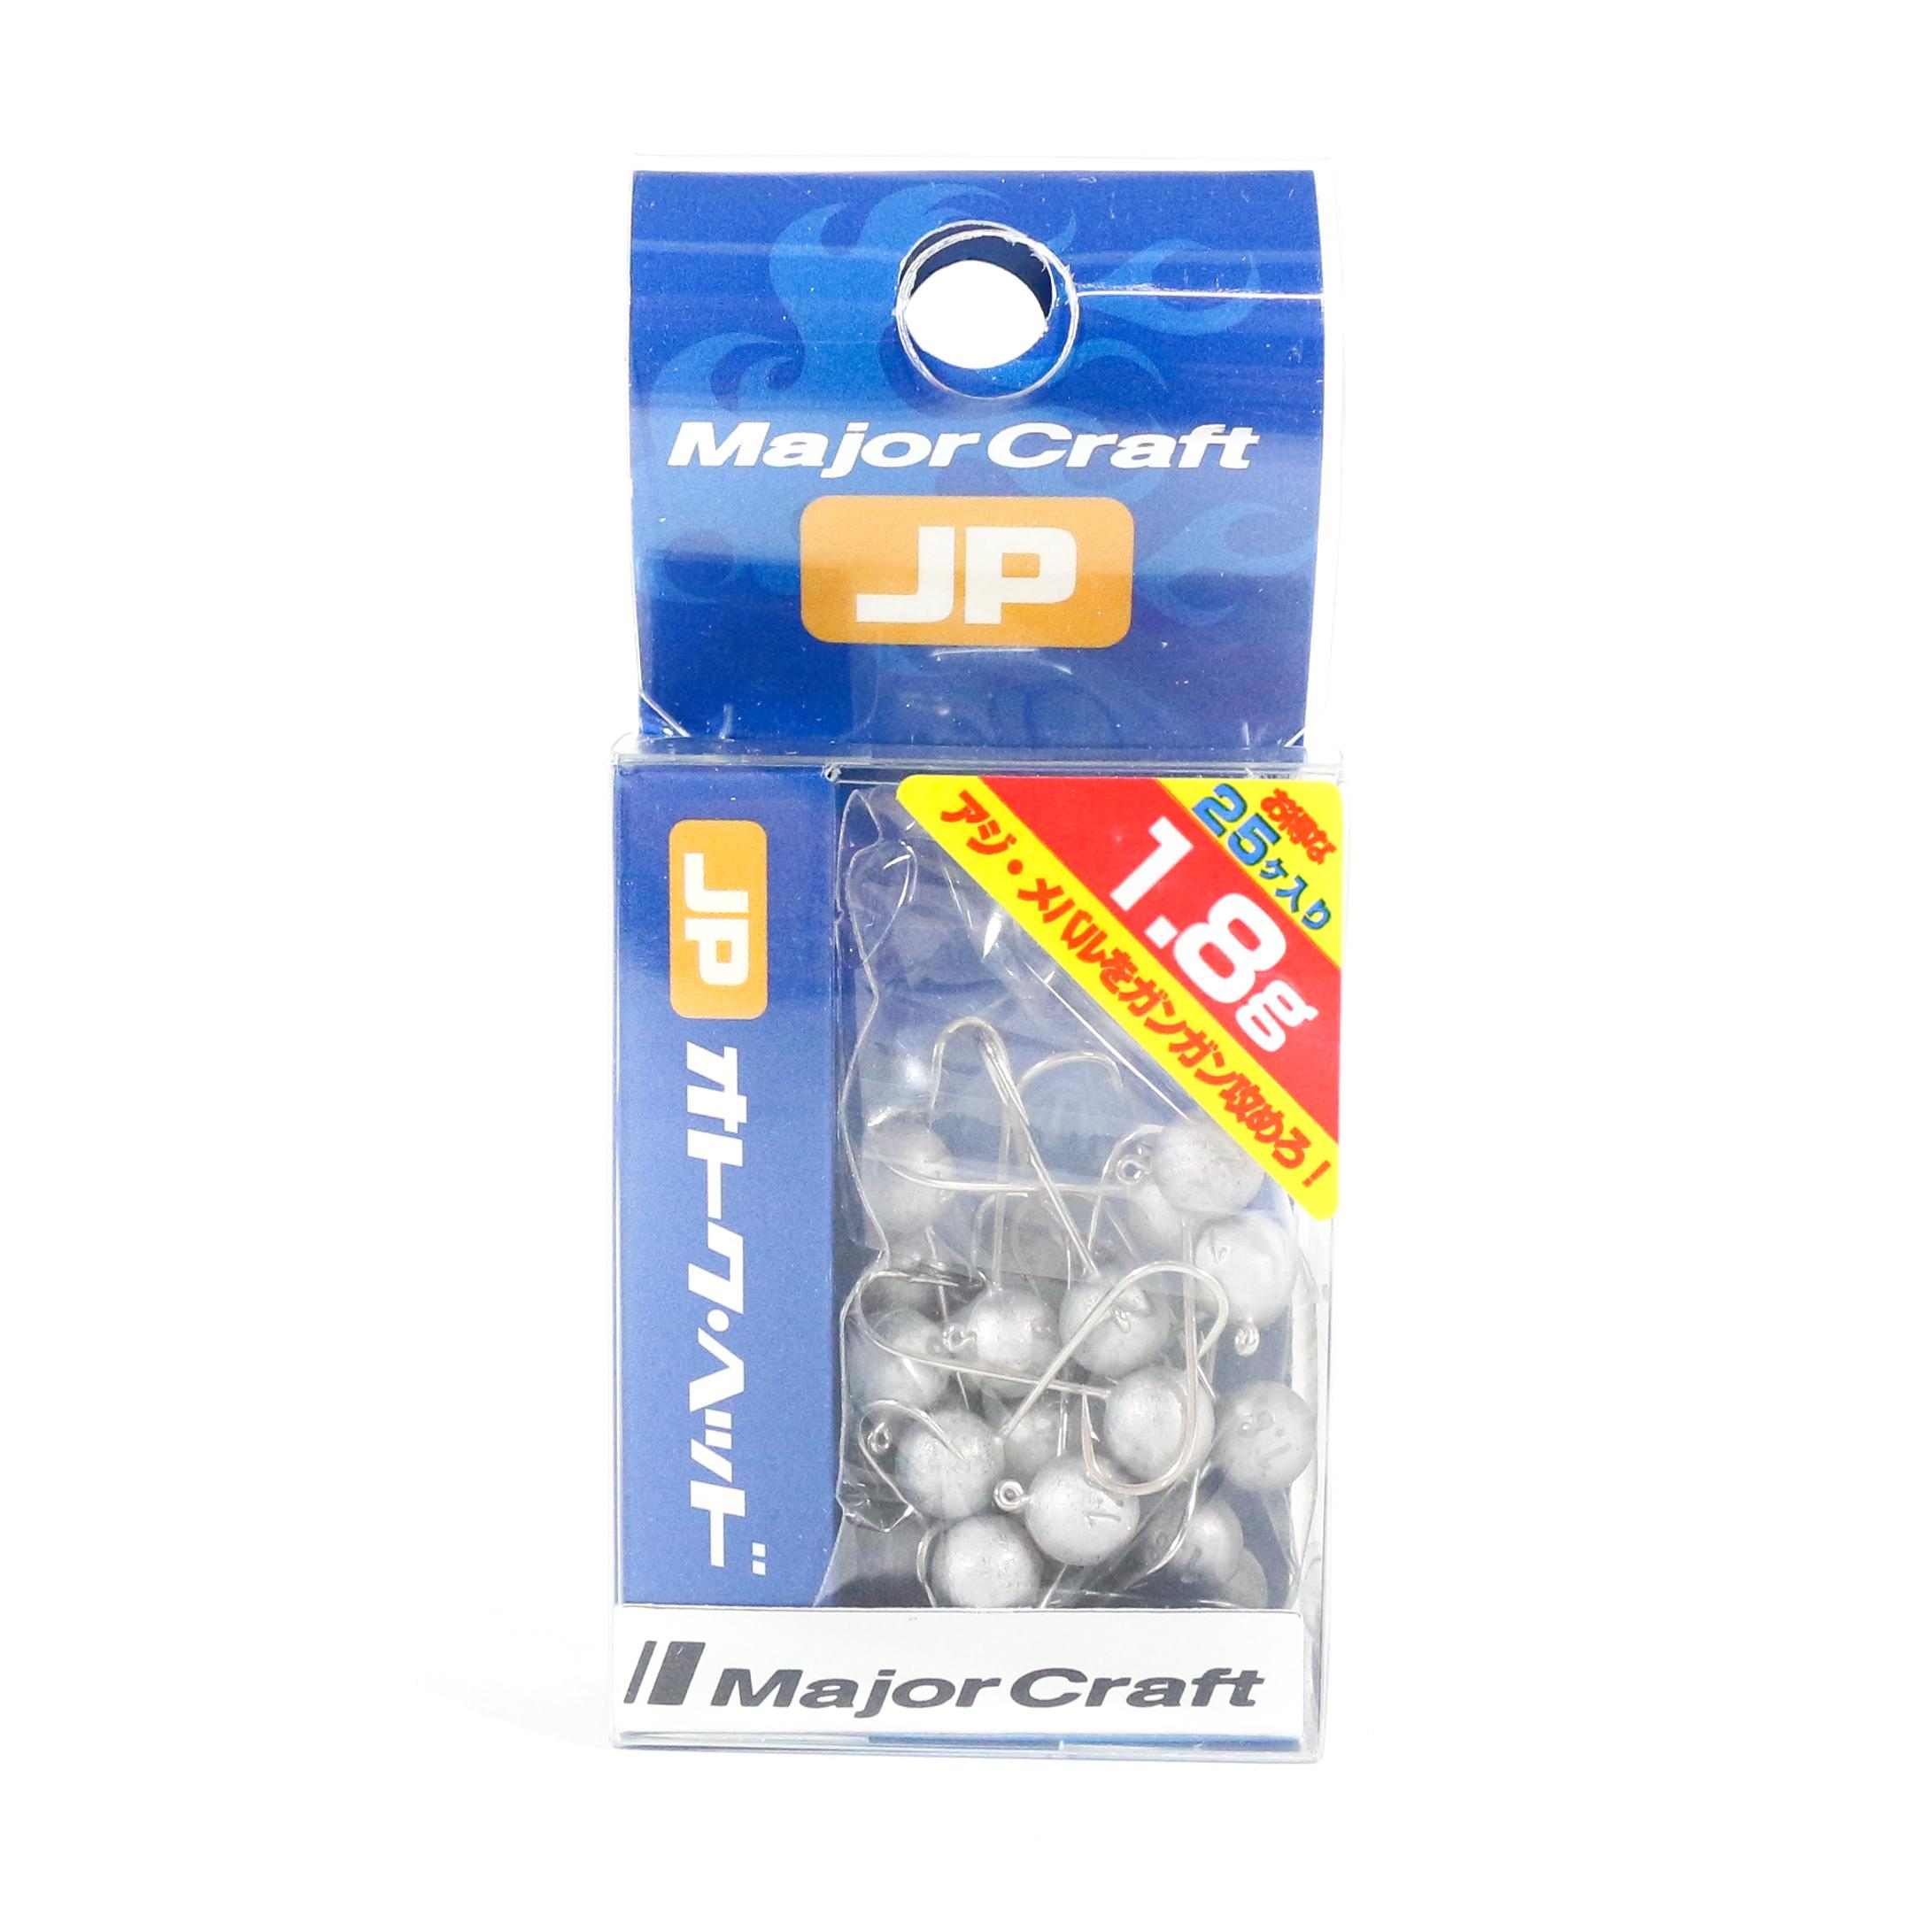 Major Craft Jig Head OTHD-1.8 grams Size 8 25 piece pack (6542)